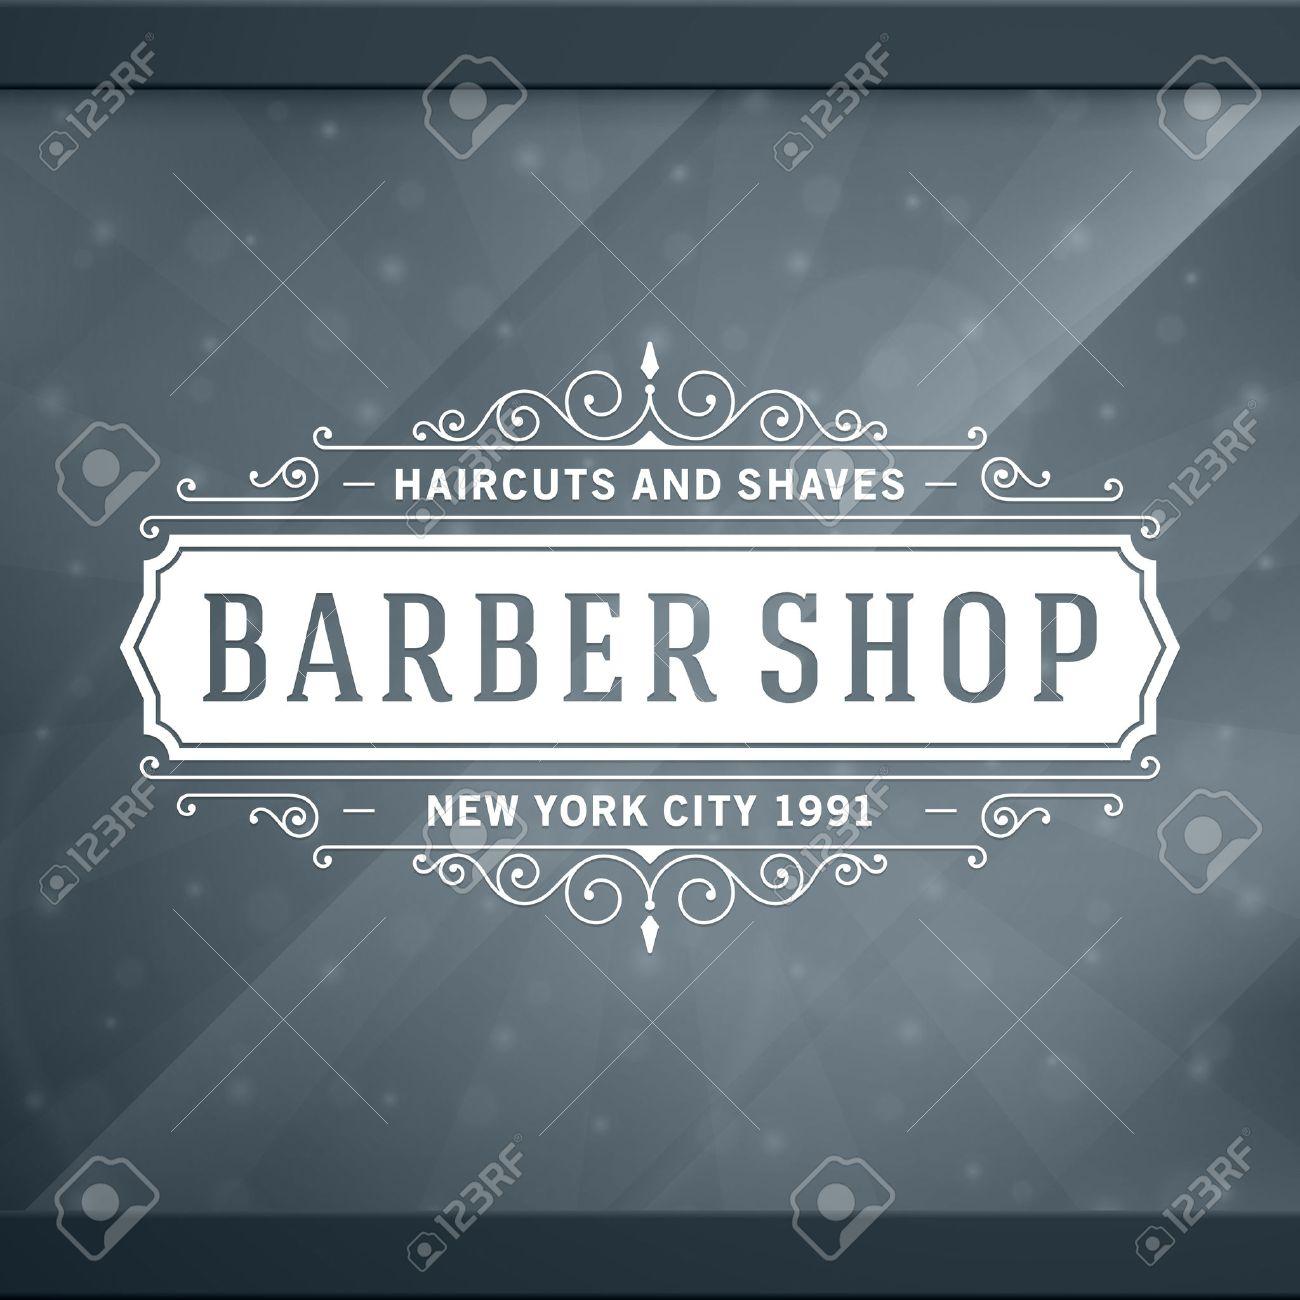 Barber shop vintage retro typographic design template Stock Vector - 26273501